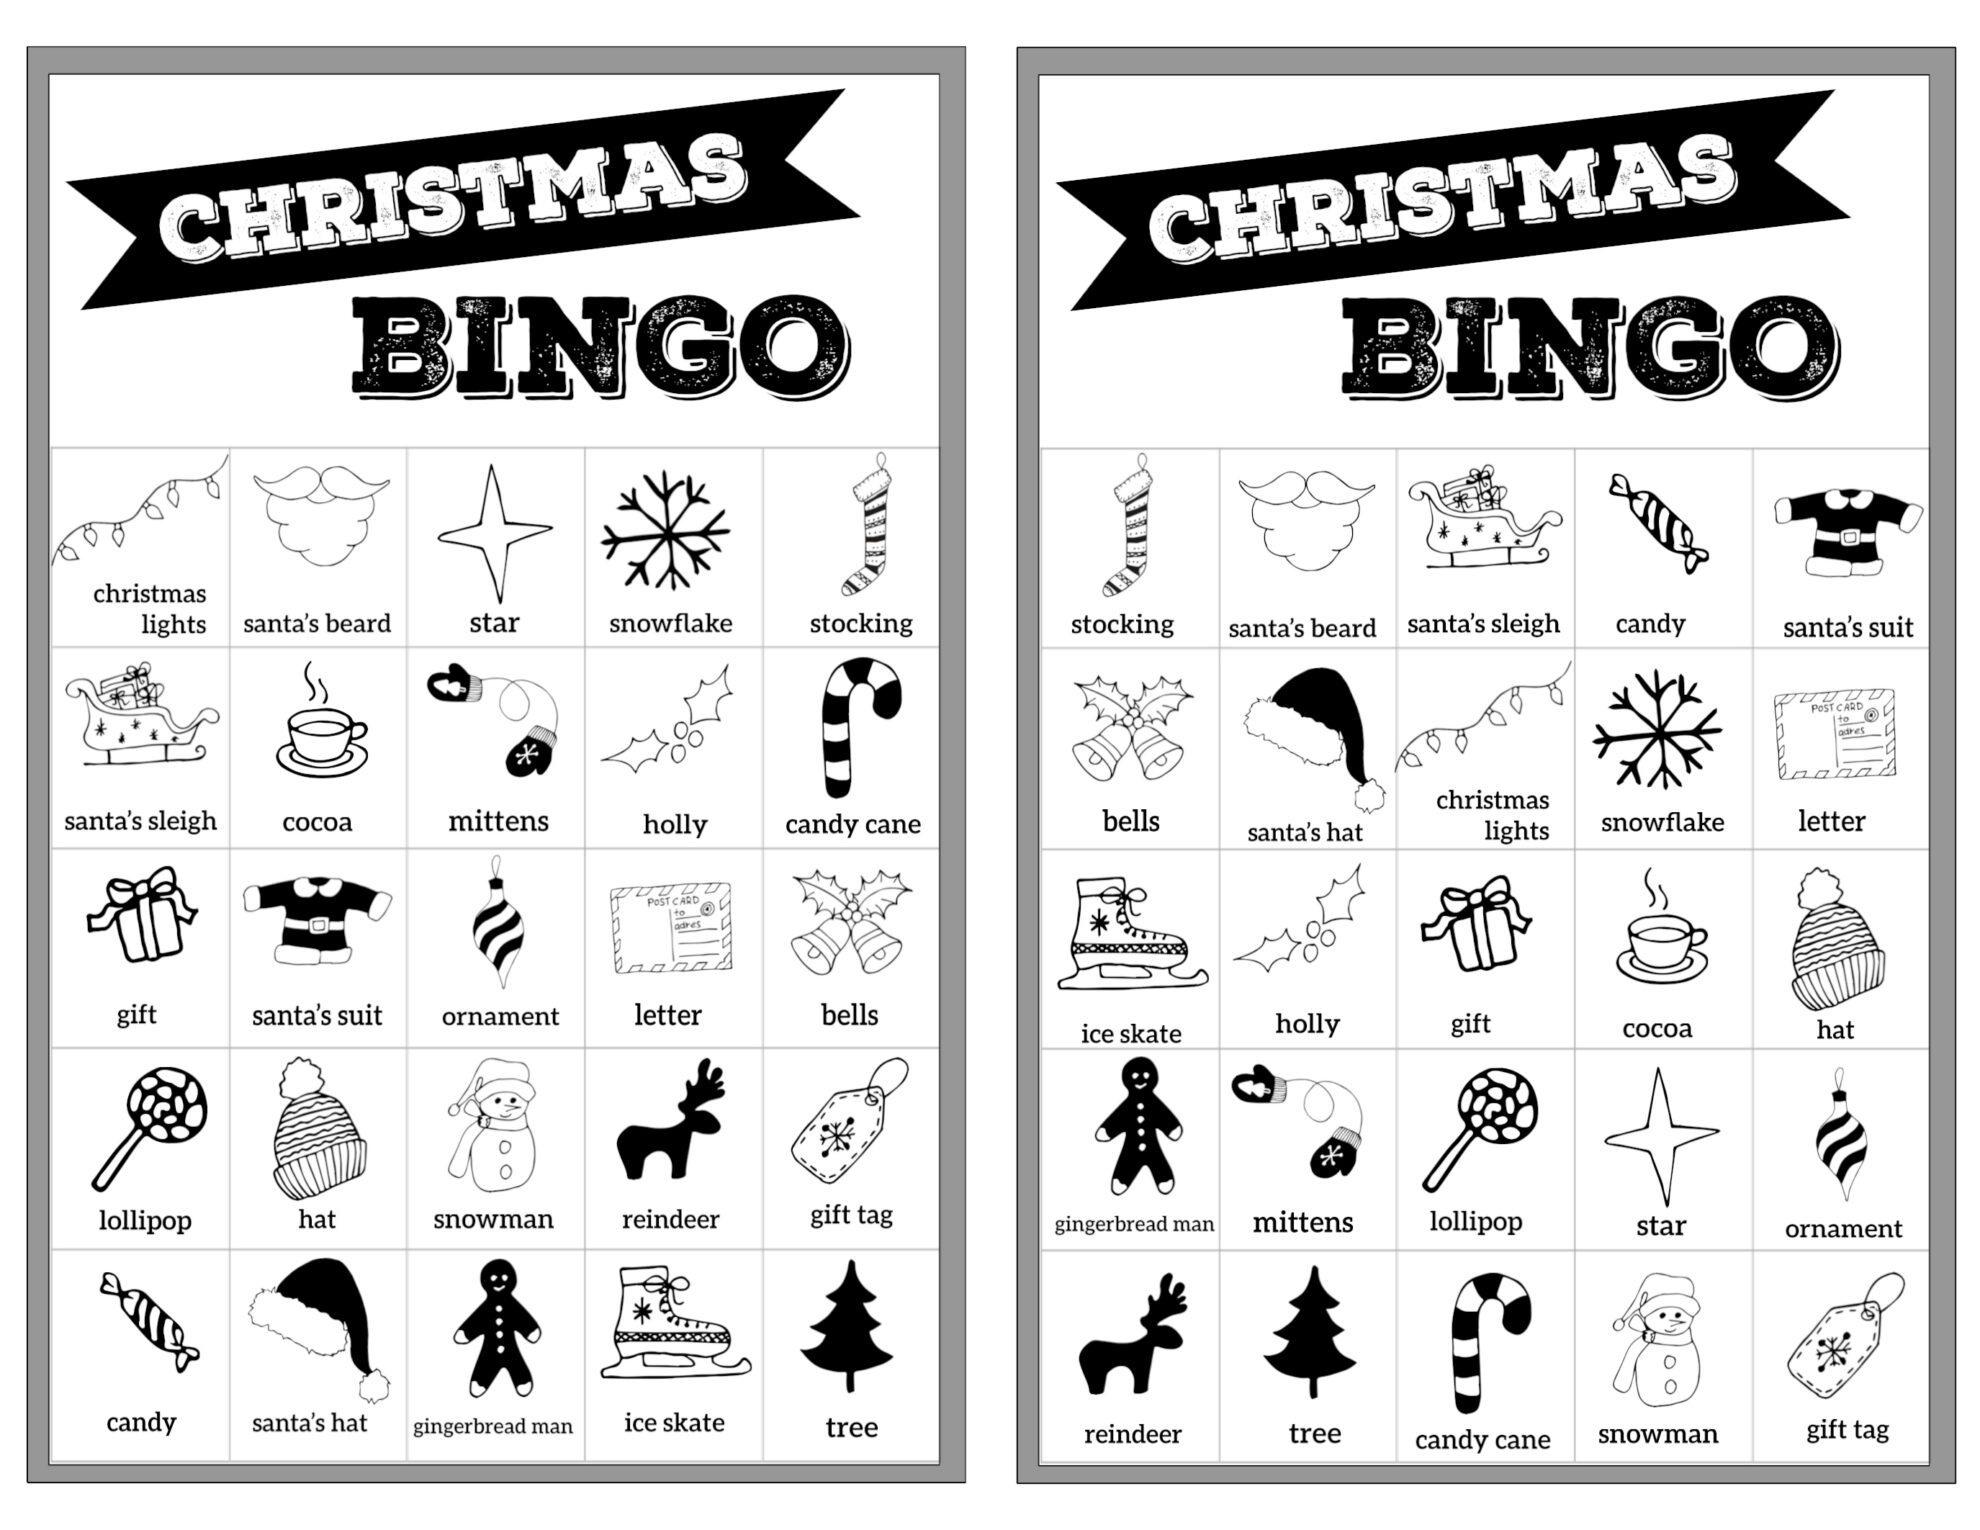 Free Christmas Bingo Printable Cards - Paper Trail Design - Free Printable Christmas Bingo